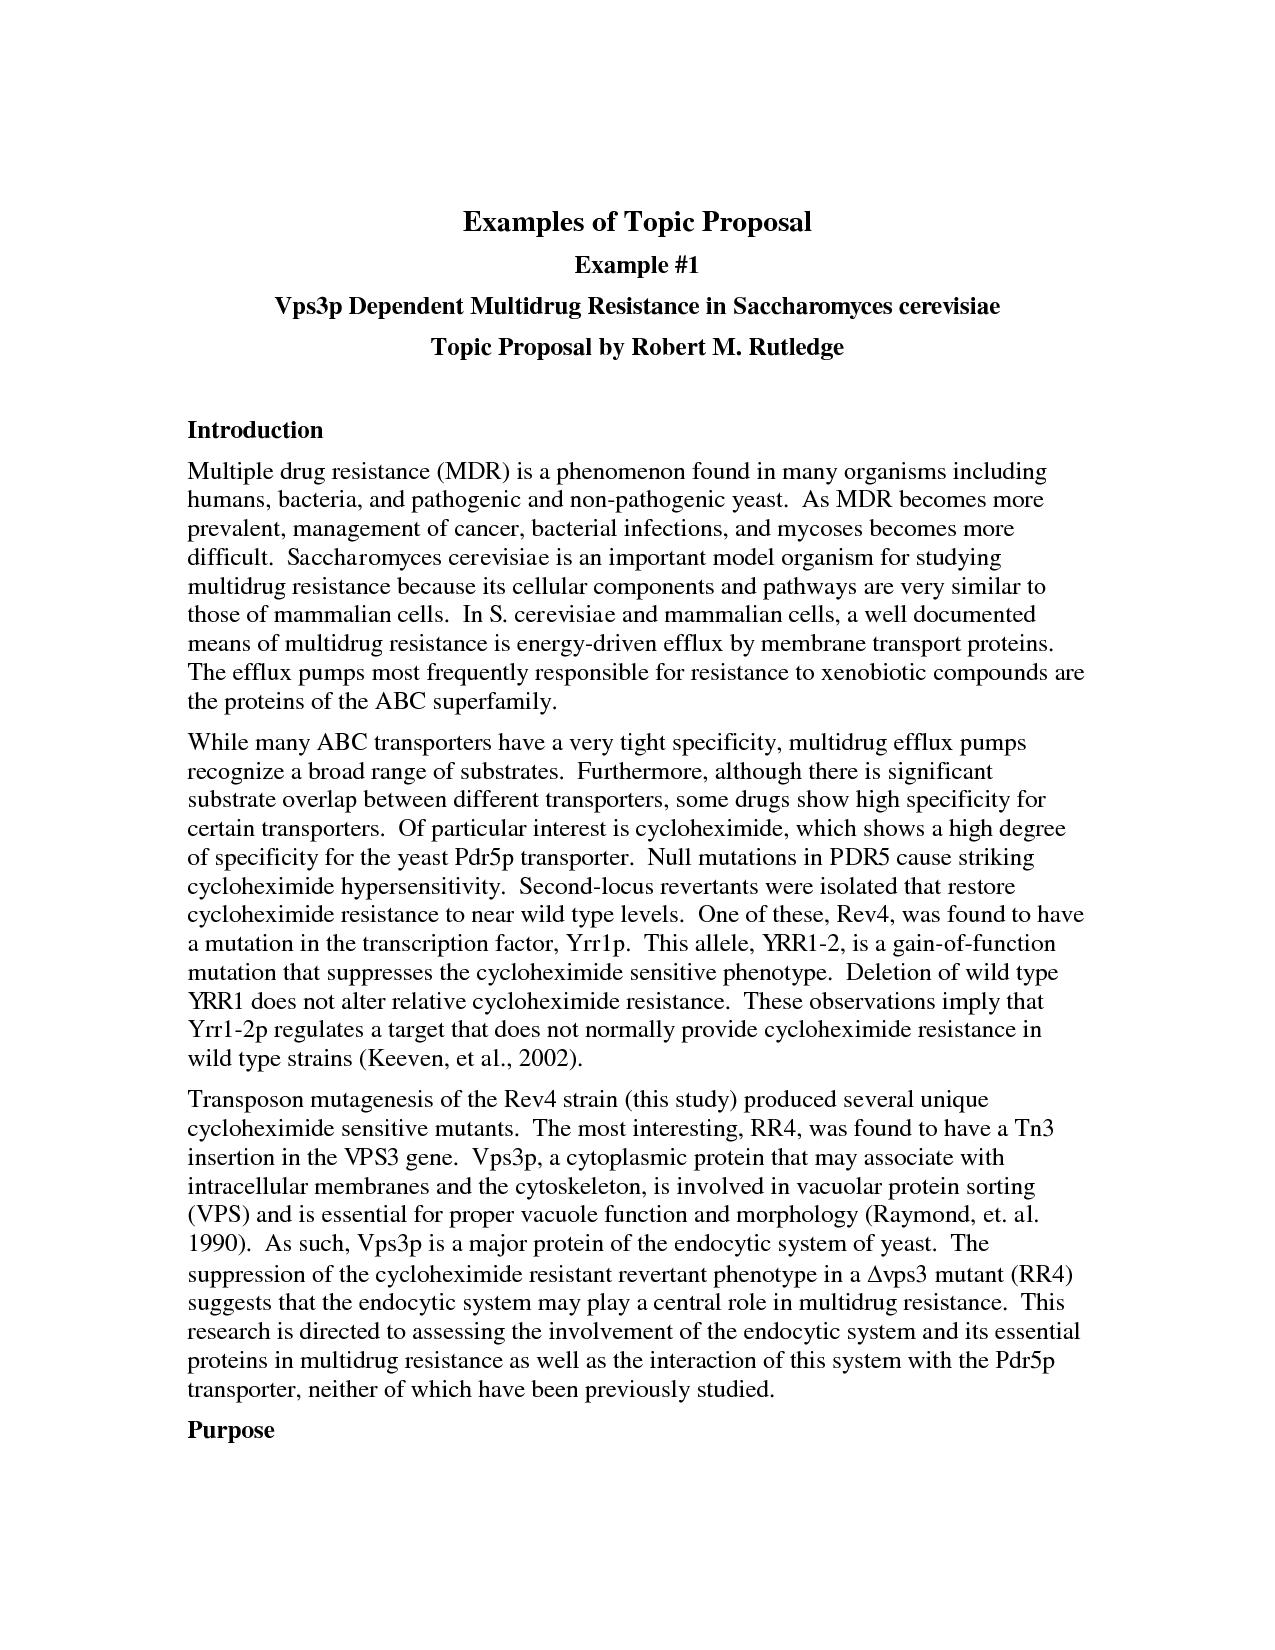 Persuasive essay topics for middle schoolers